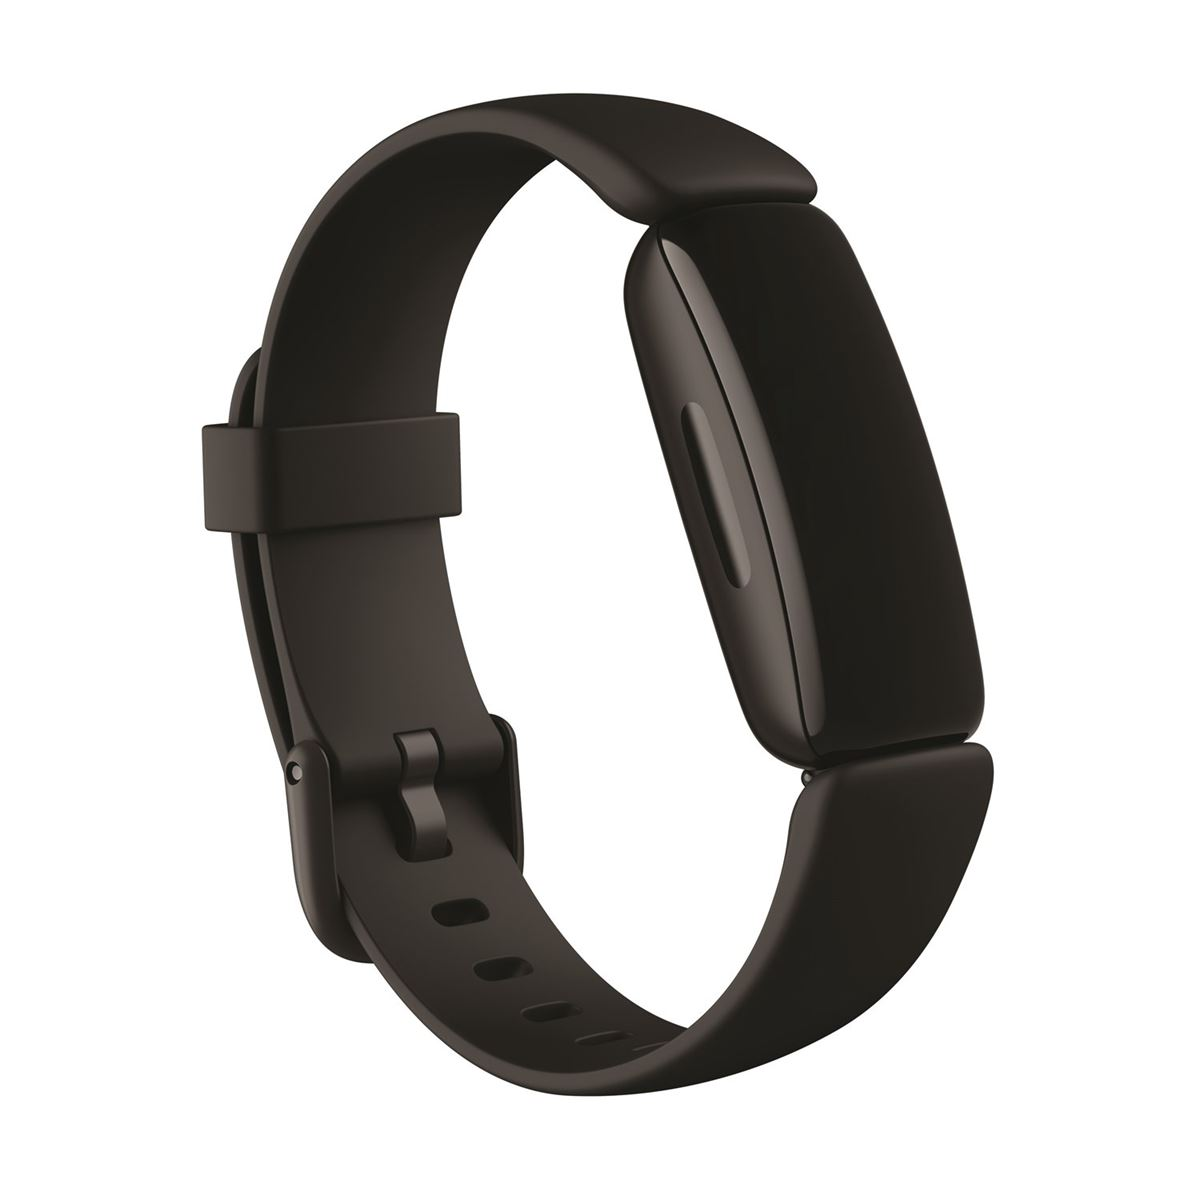 fitbit フィットビット Inspire 2 インスパイア 2 フィットネス スマートウォッチ ウェアラブル端末 腕時計 ブラック FB418BKBK-FRCJK